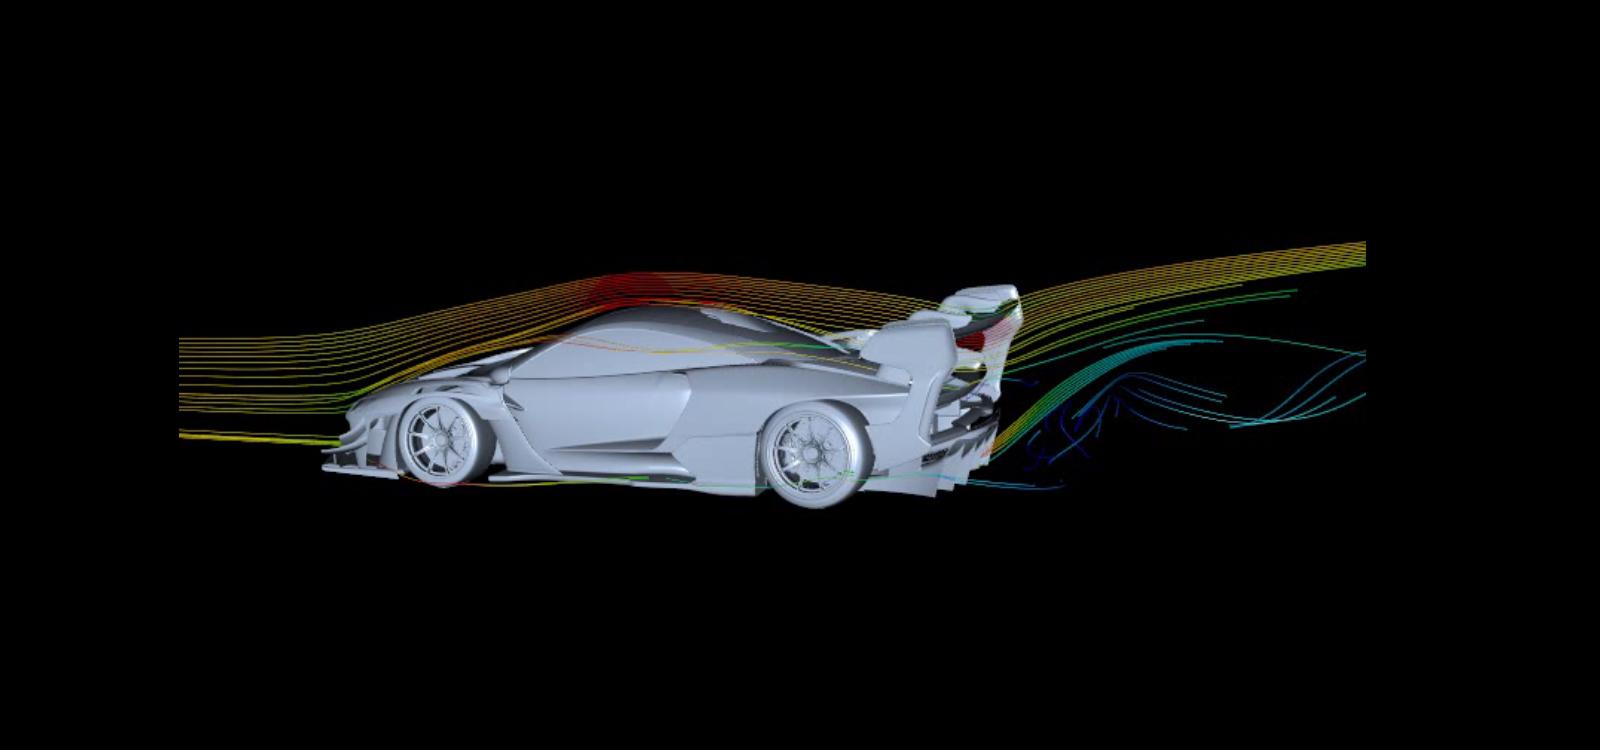 Senna GTR CFD1 aero side